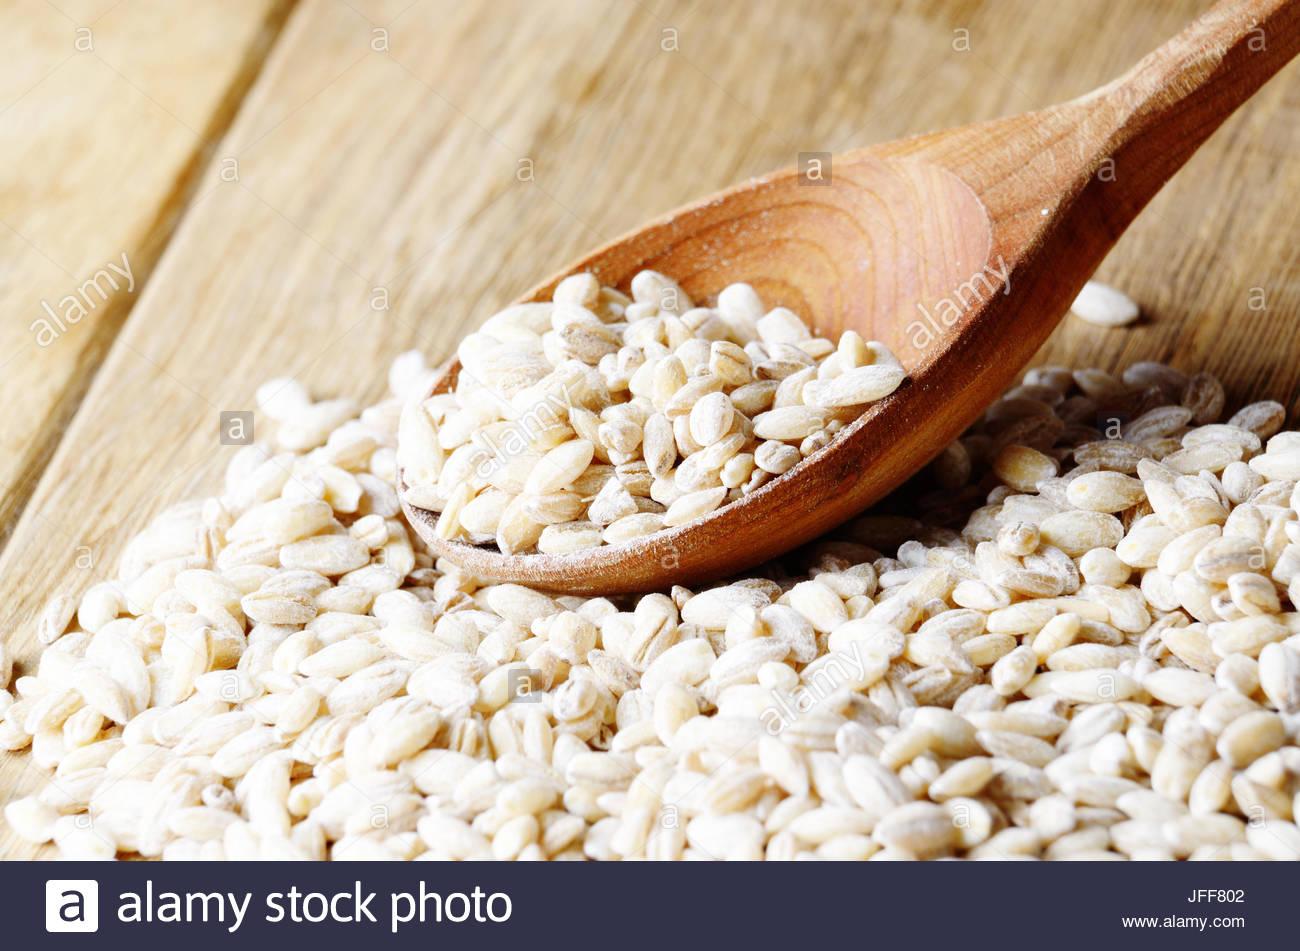 Barley grains - Stock Image